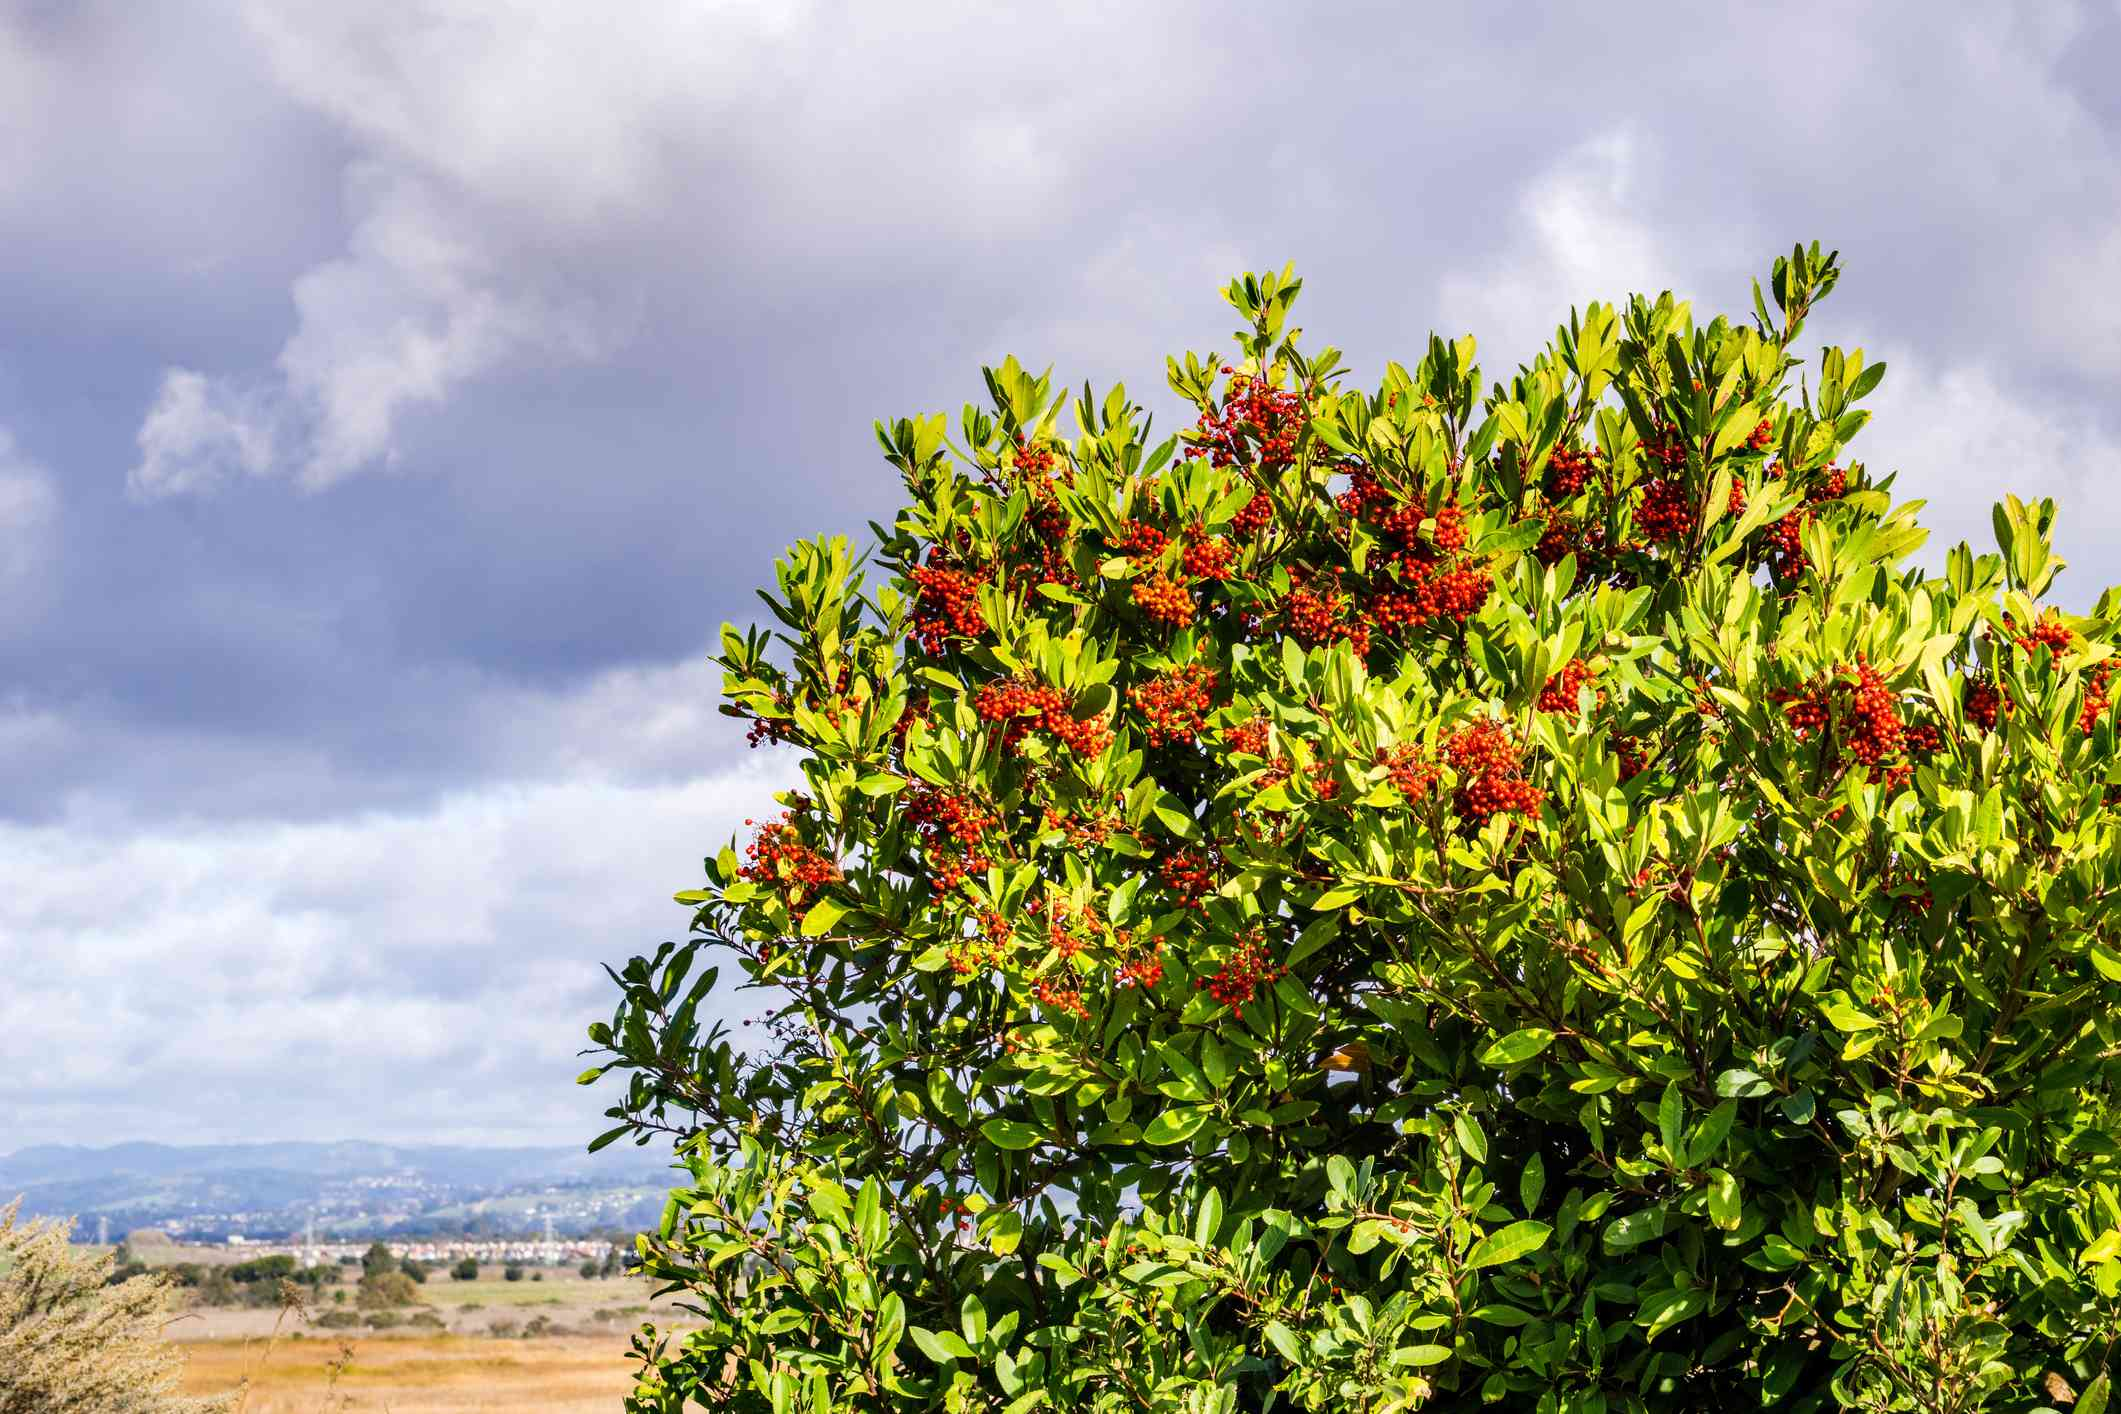 Toyon (Heteromeles) shrubs full of red berries, Coyote Hills Regional Park, Fremont, east San Francisco bay, California